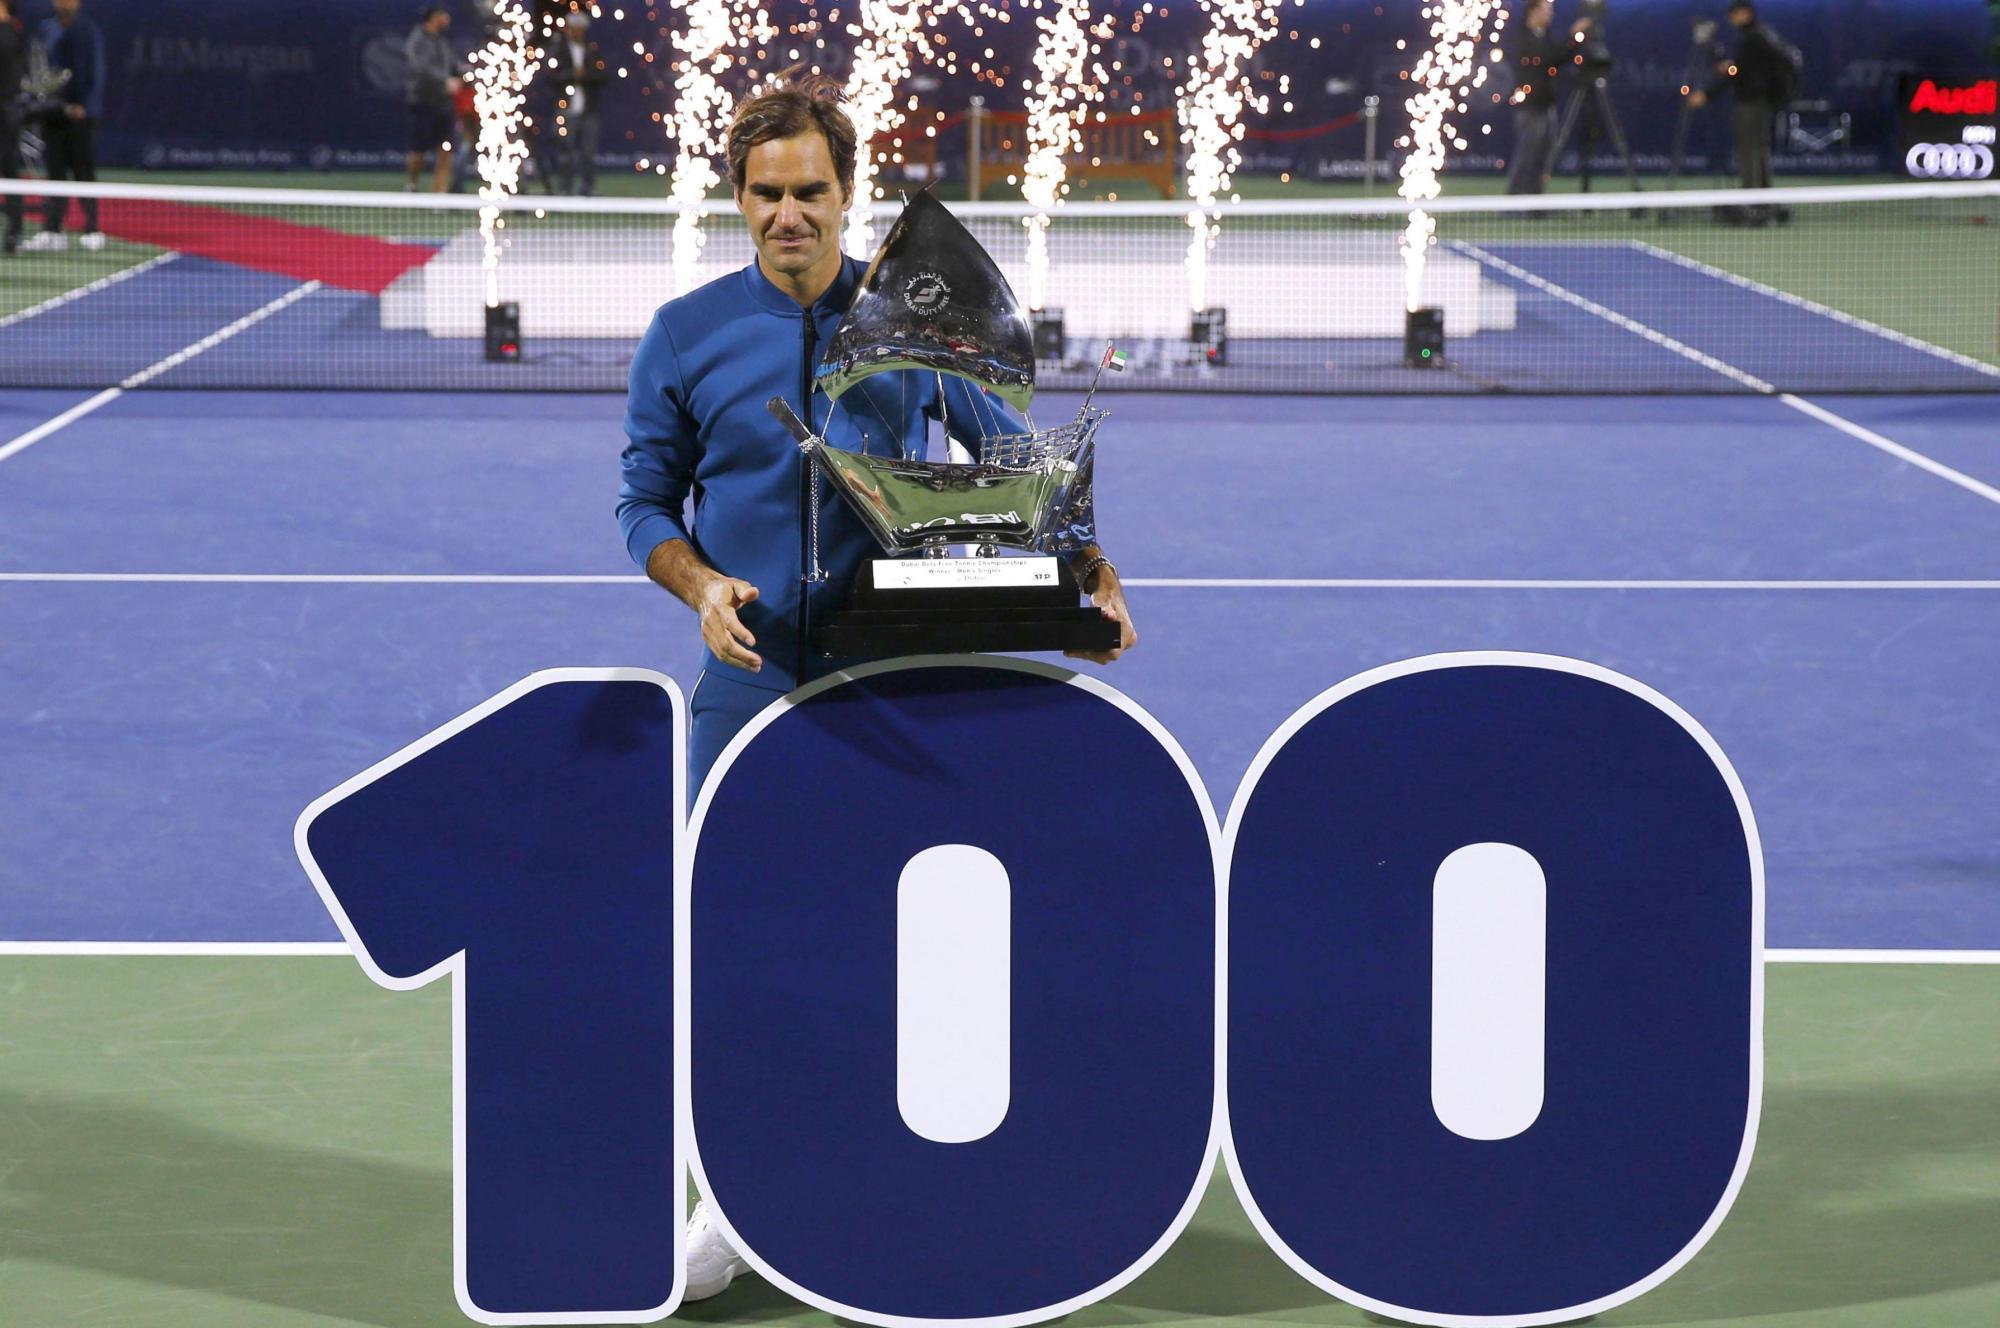 Federer wins 100th title